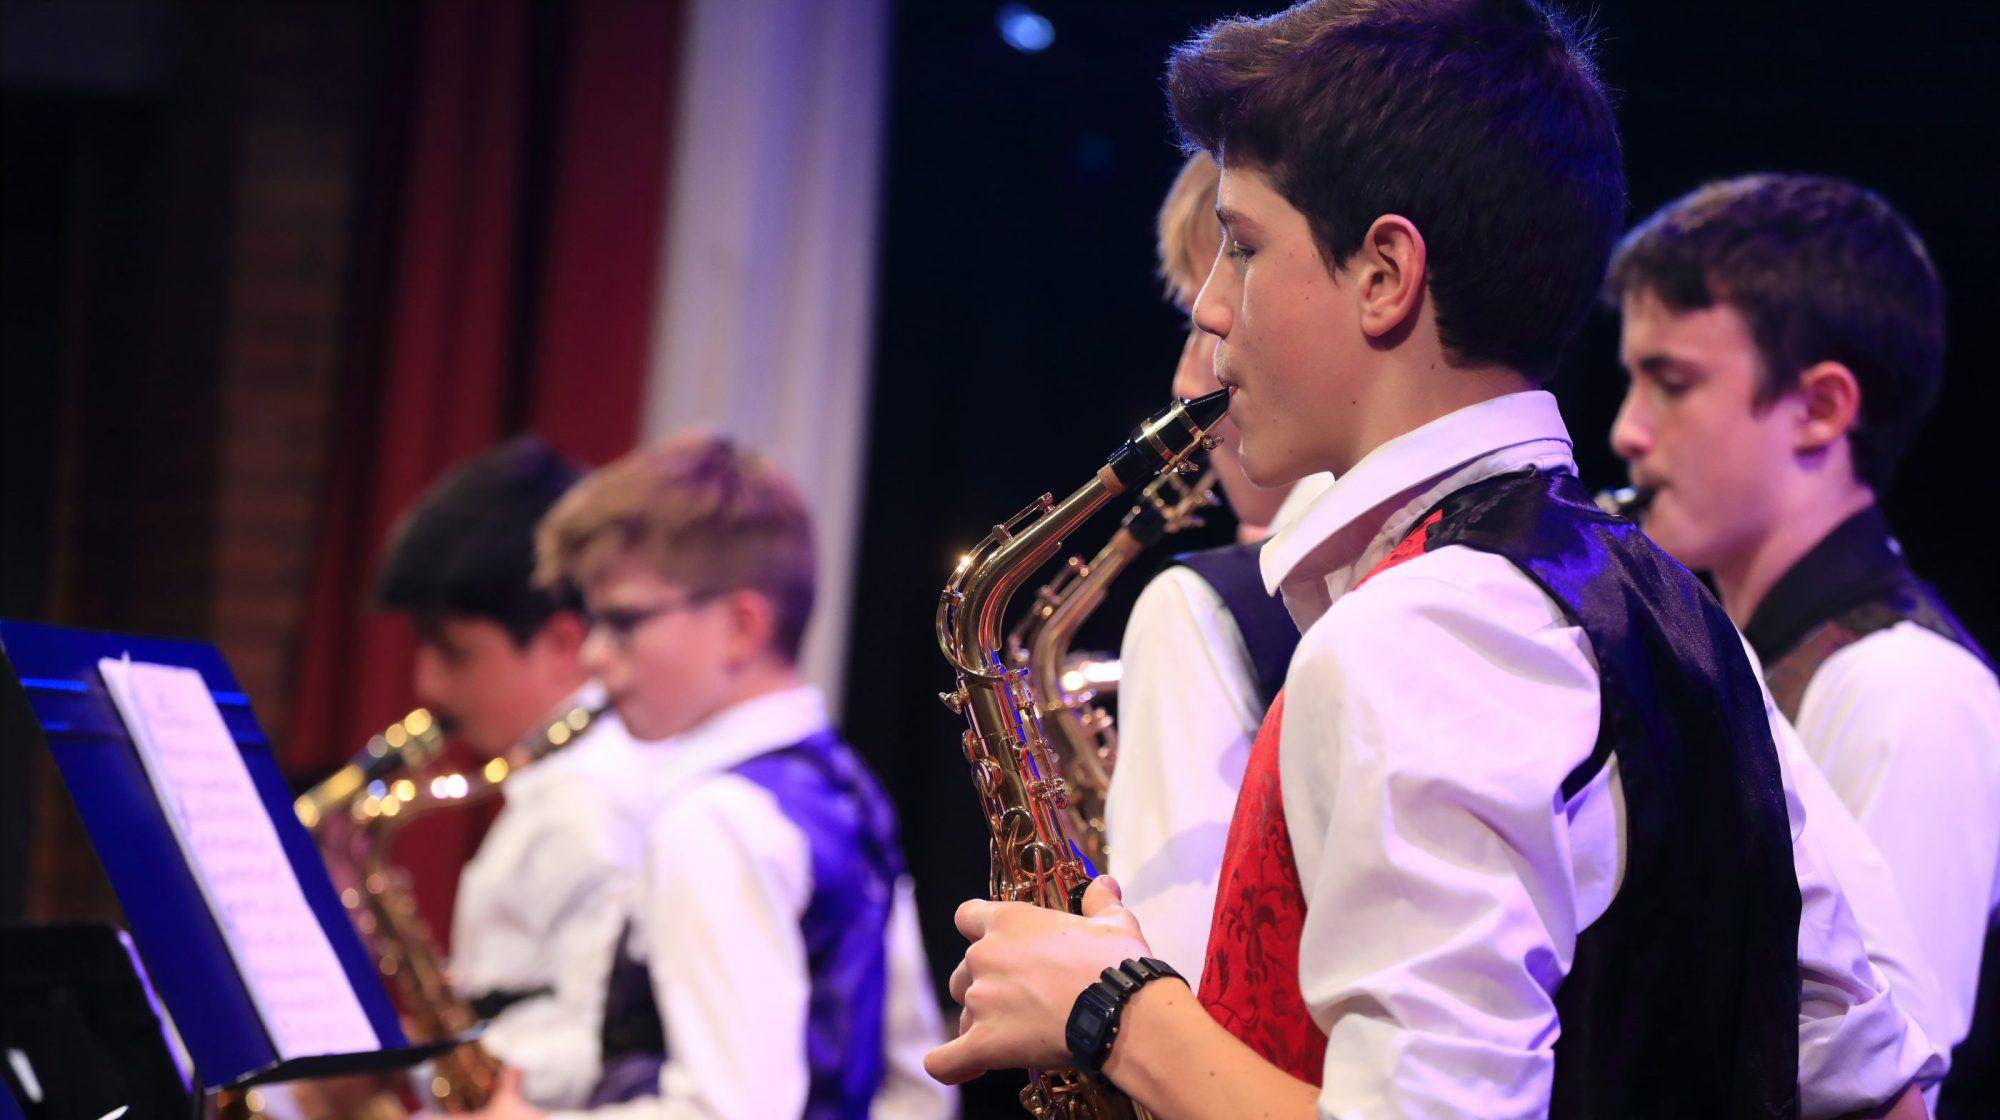 Abingdon School Music Scholarships